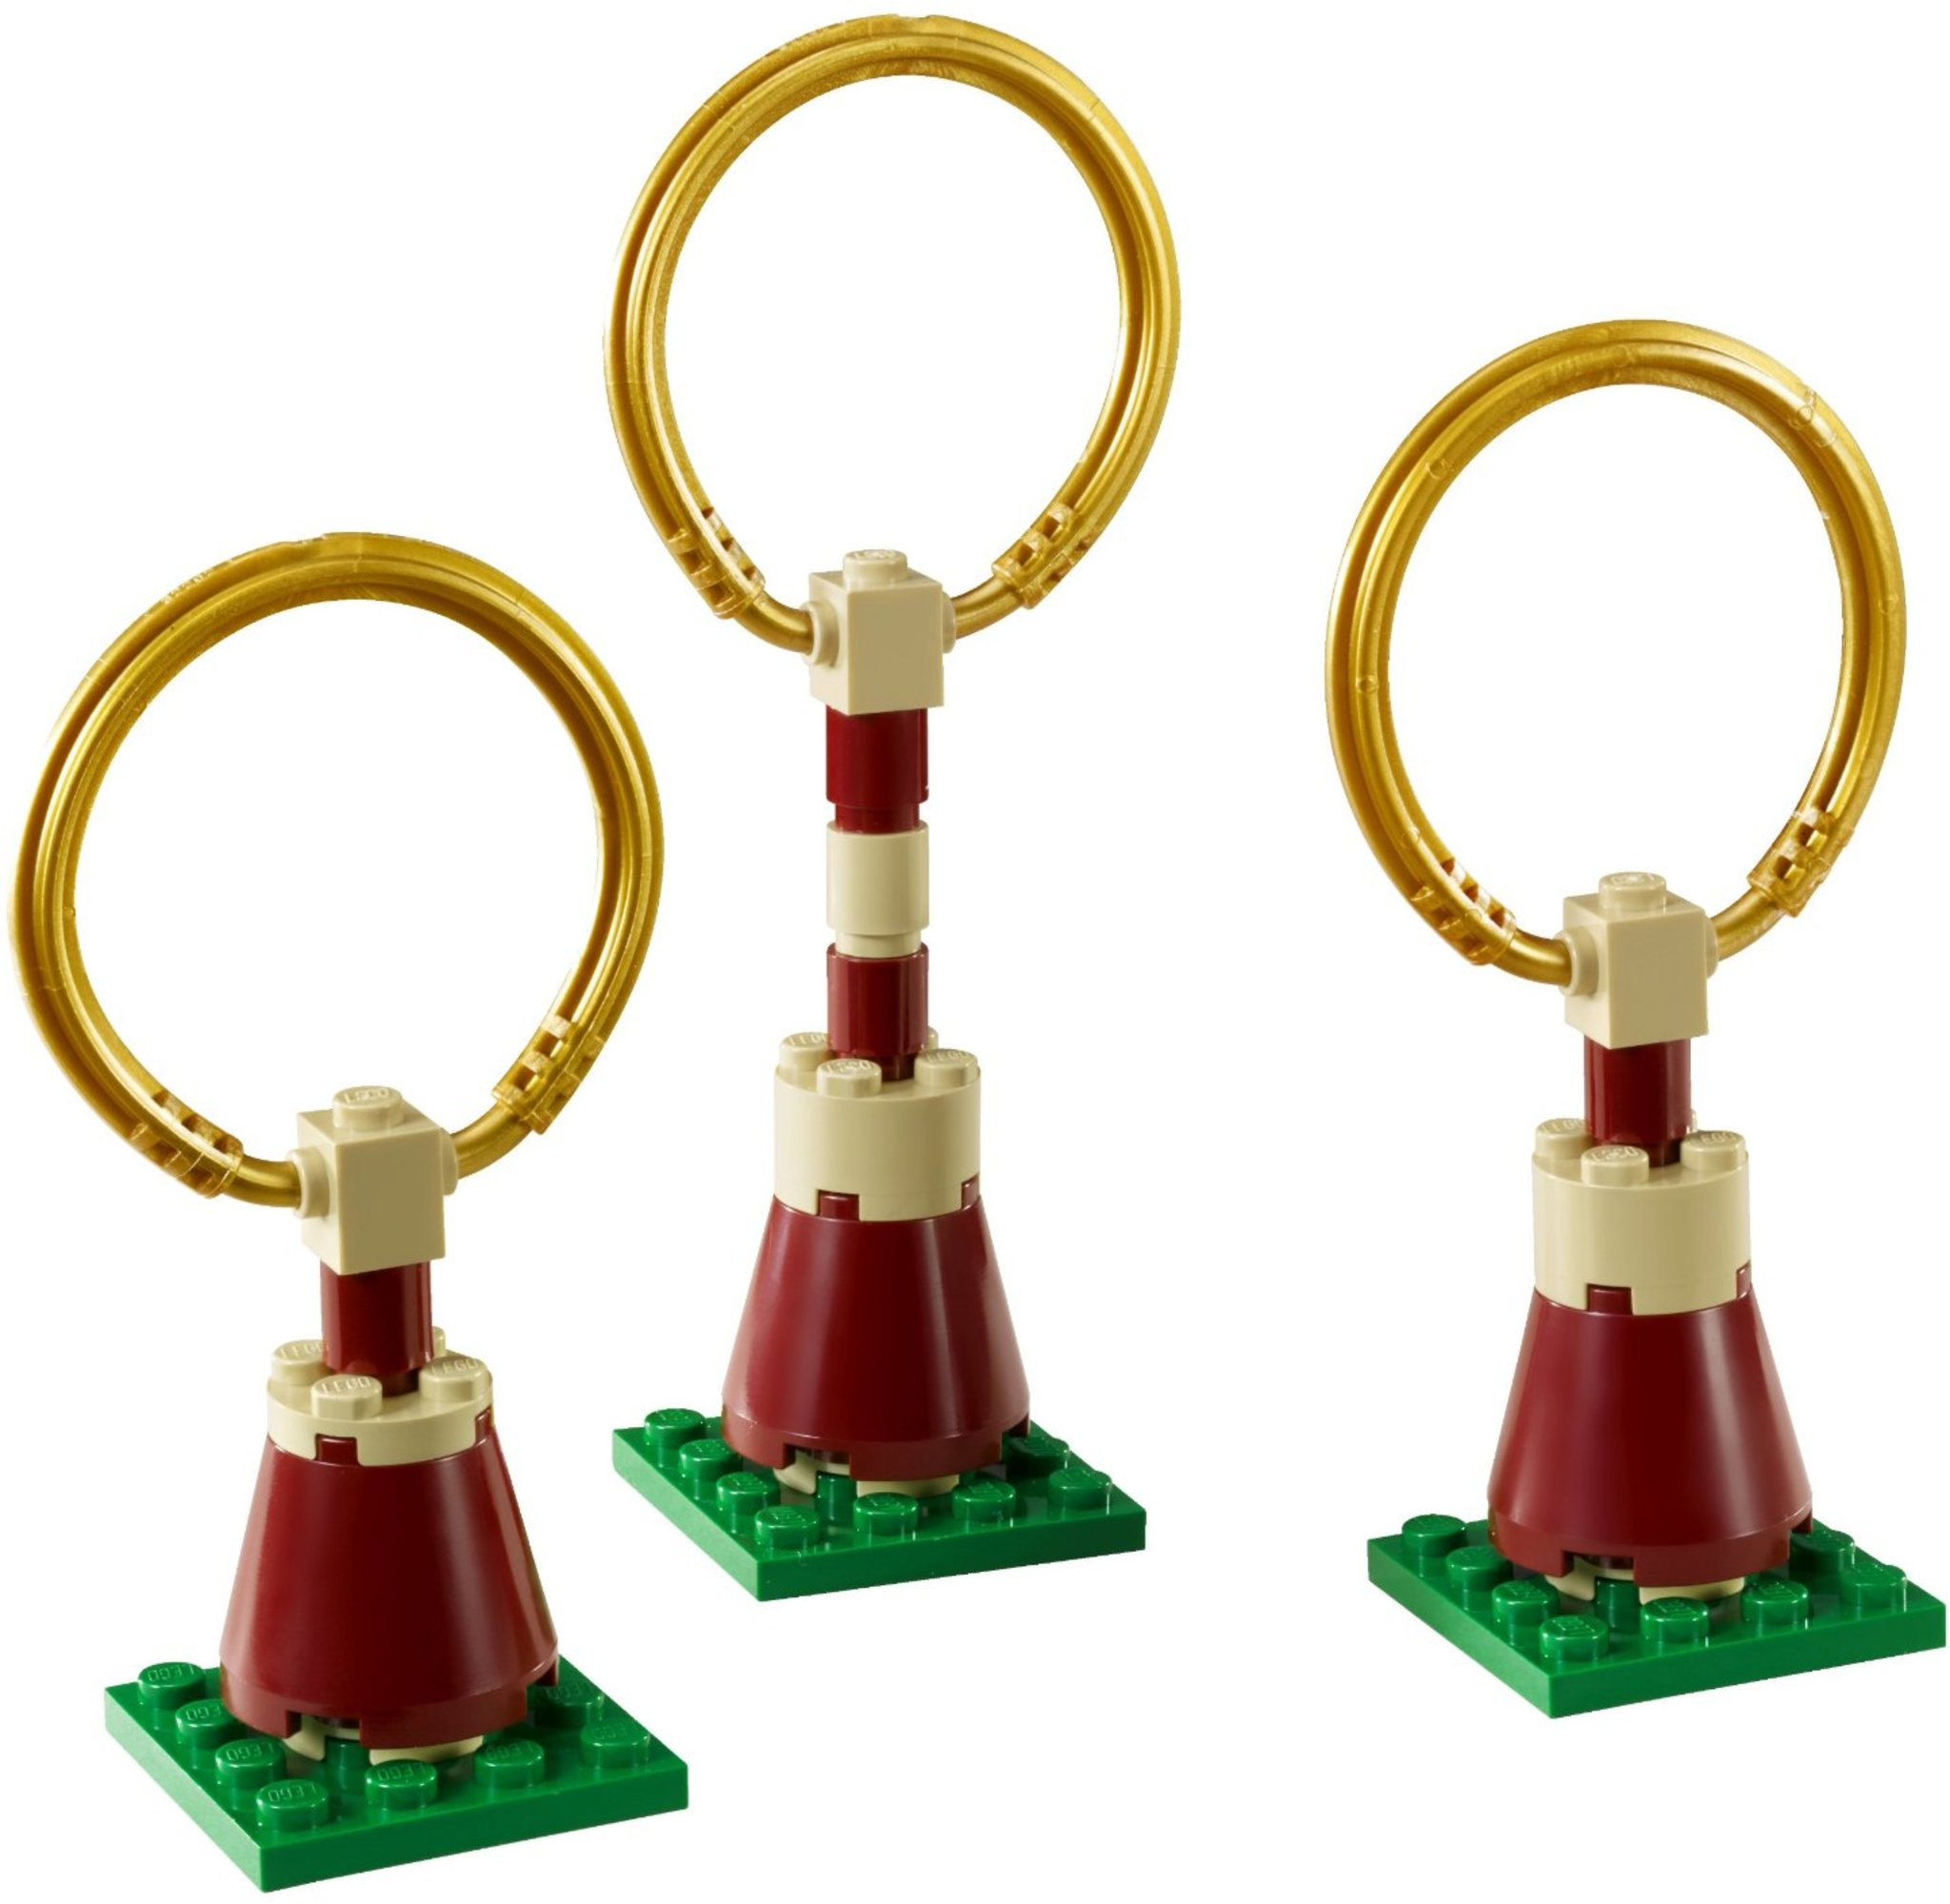 LEGO Harry Potter 4737 - Quidditch Match   Mattonito